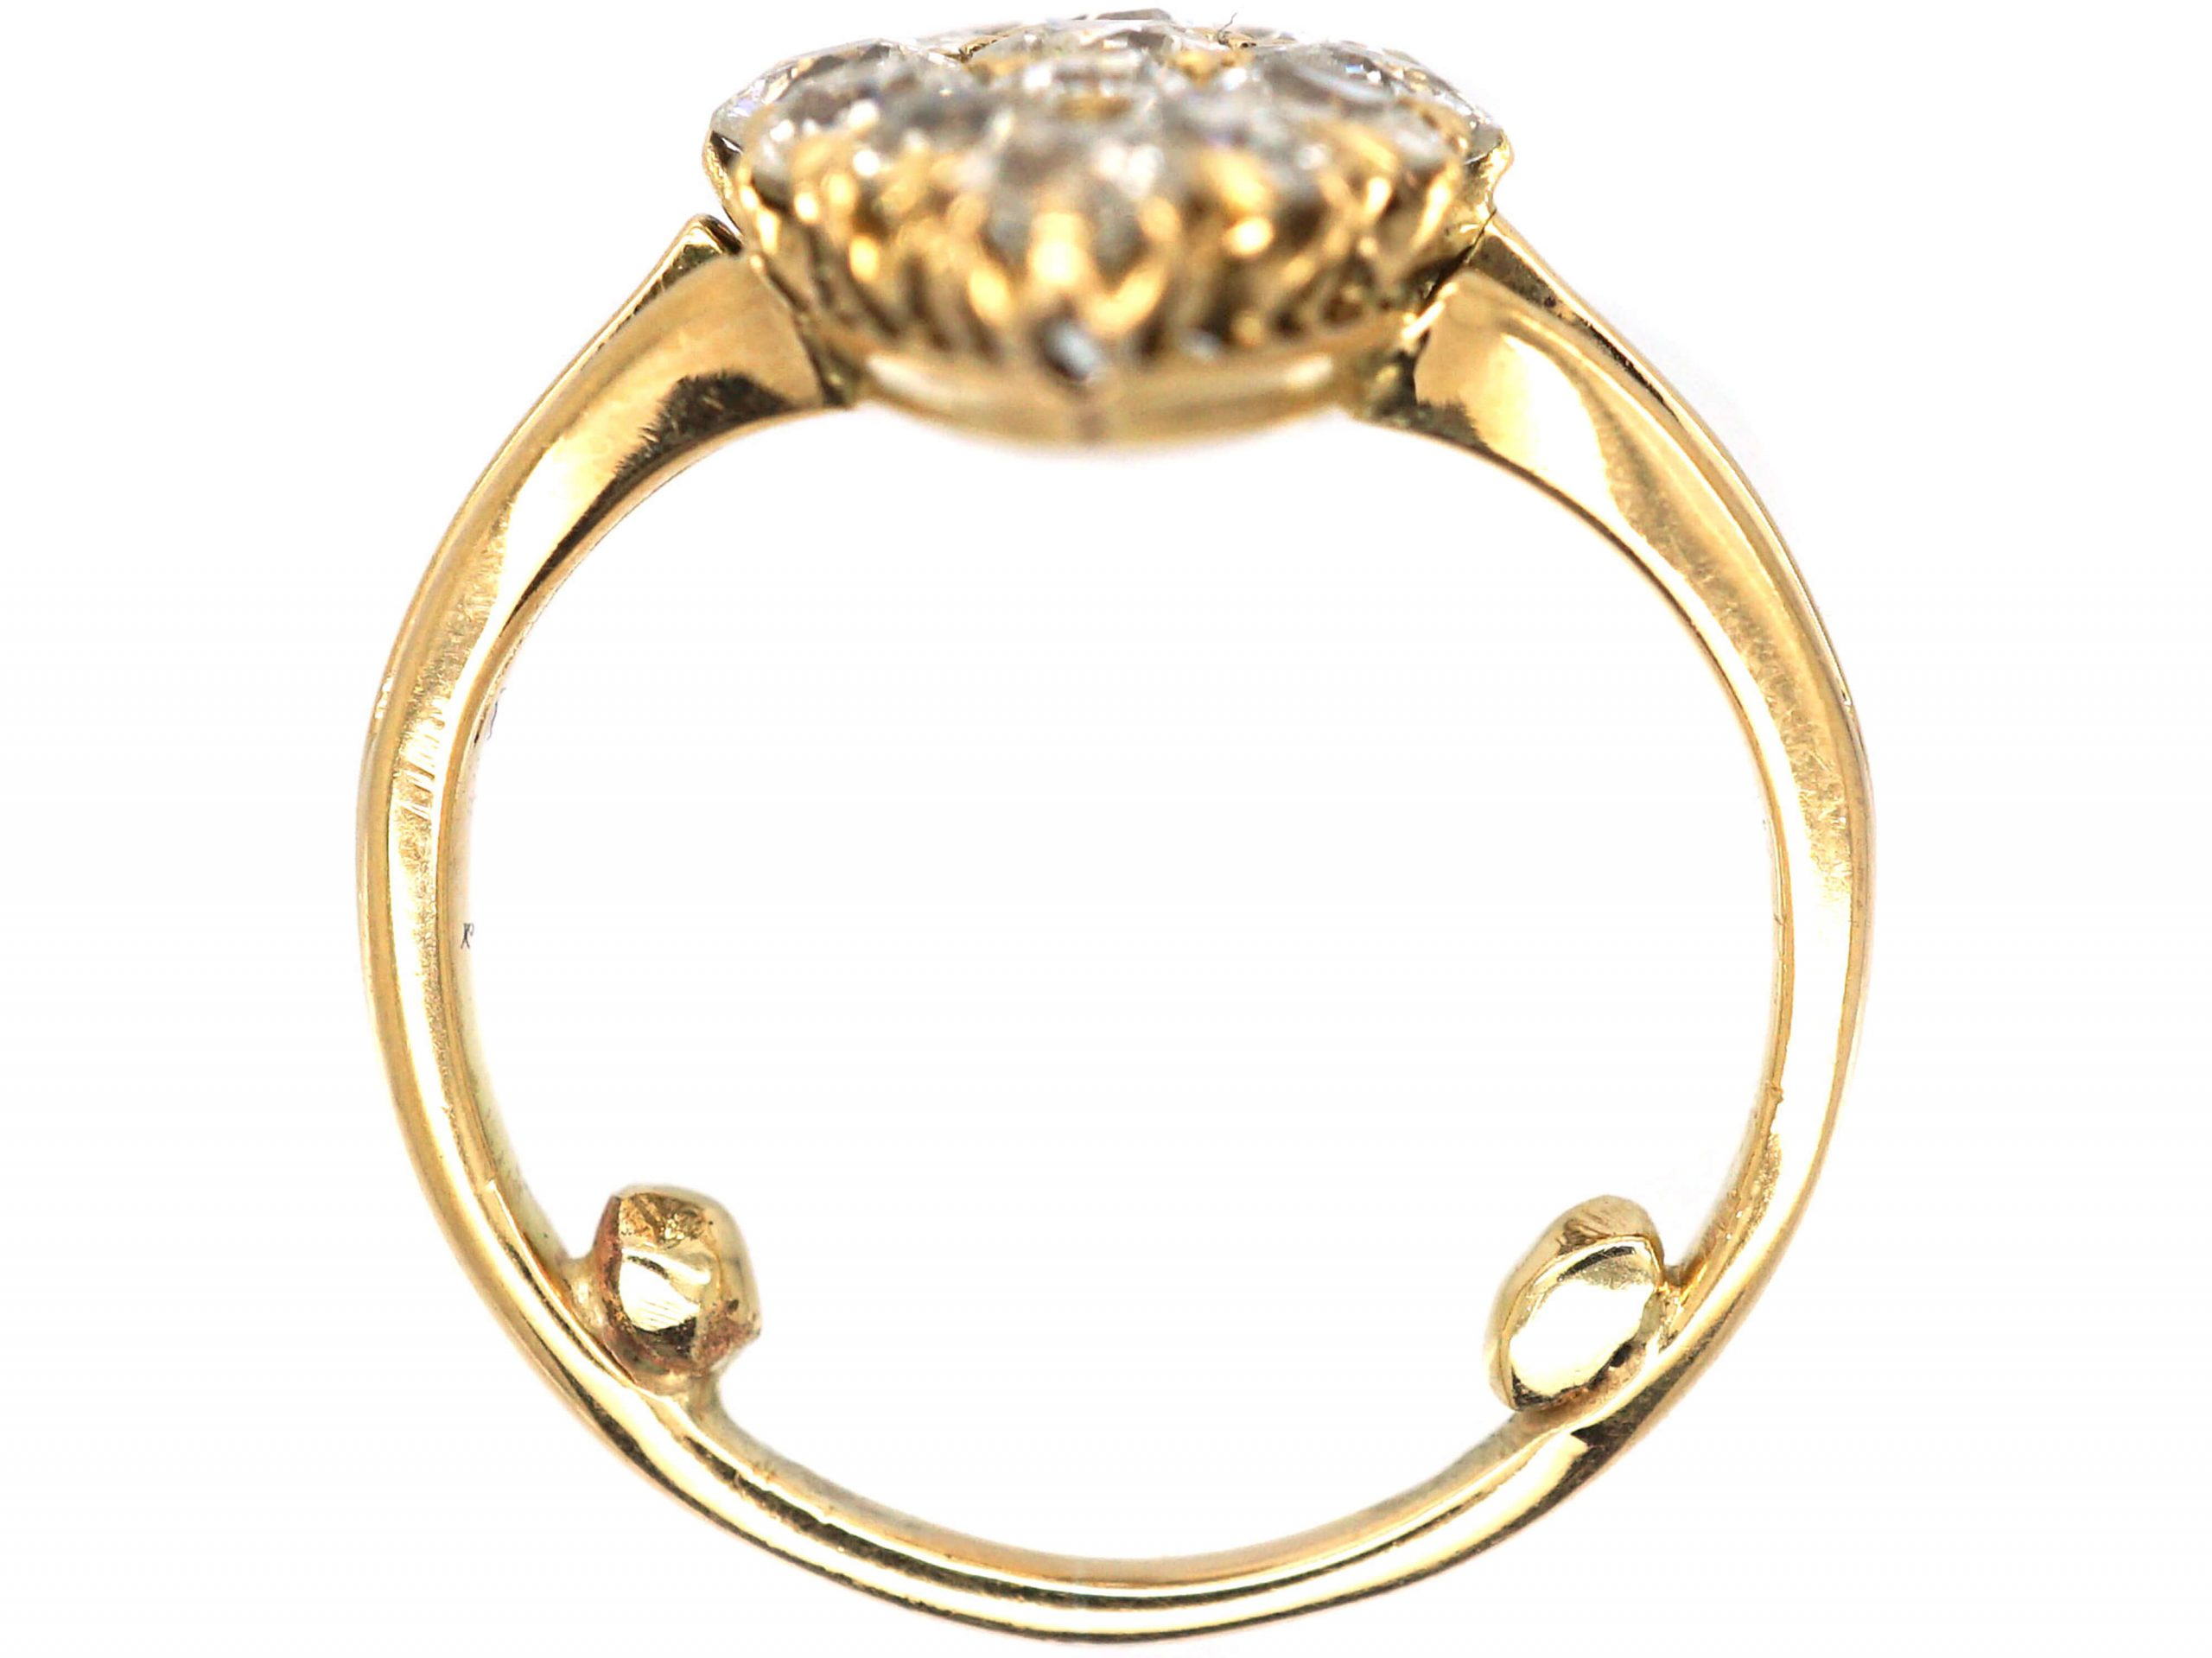 Edwardian 18ct Gold & Diamond Marquise Ring